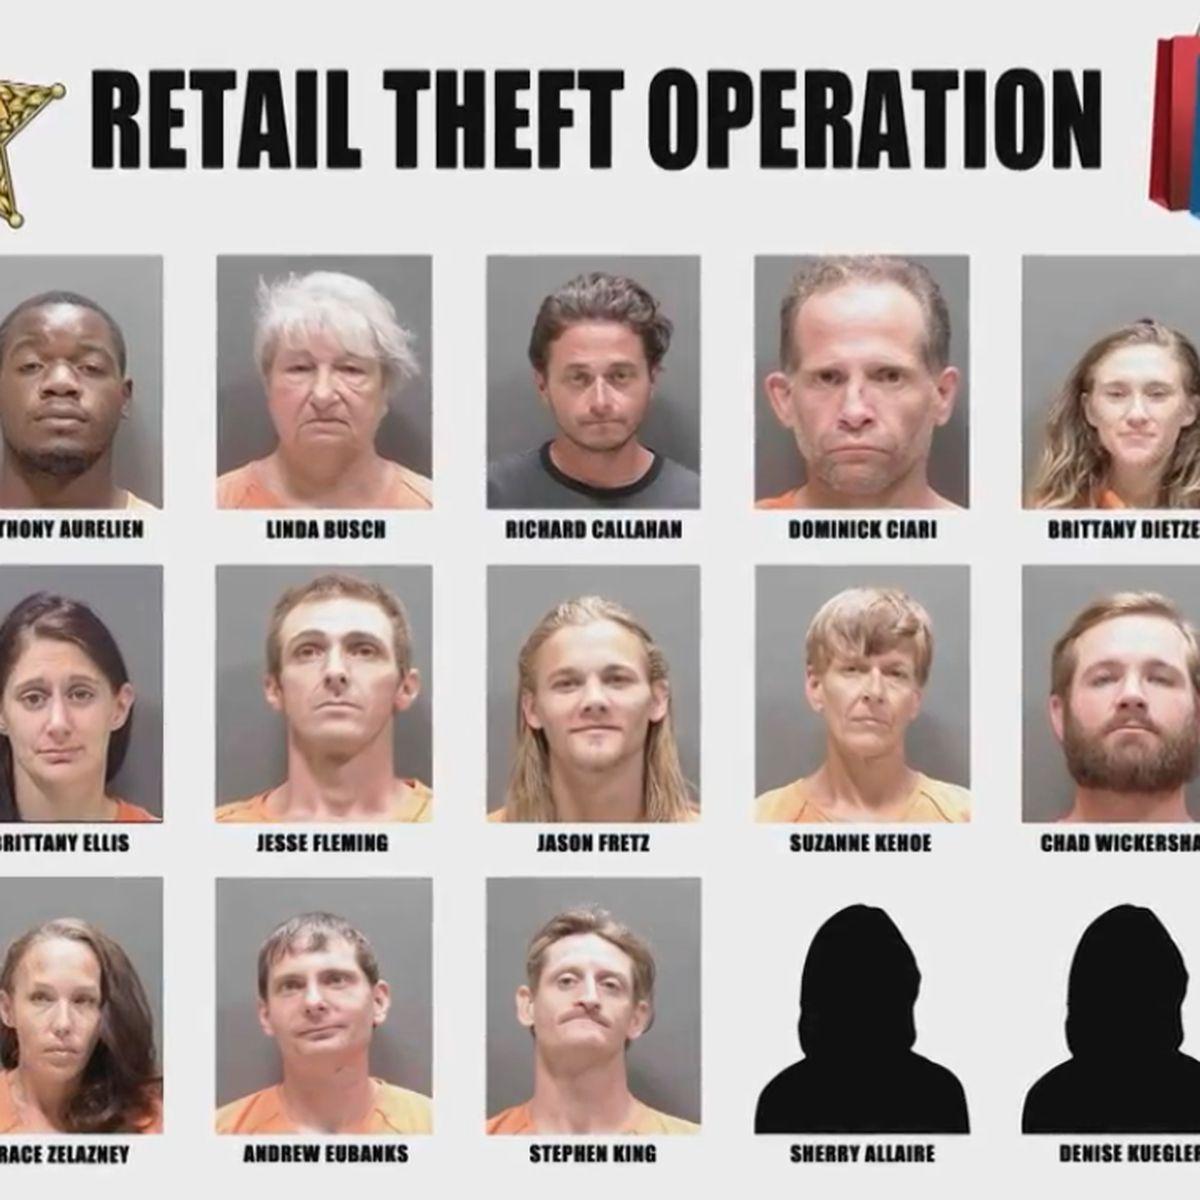 Sarasota County Deputies arrest 15 in Retail Theft Operation